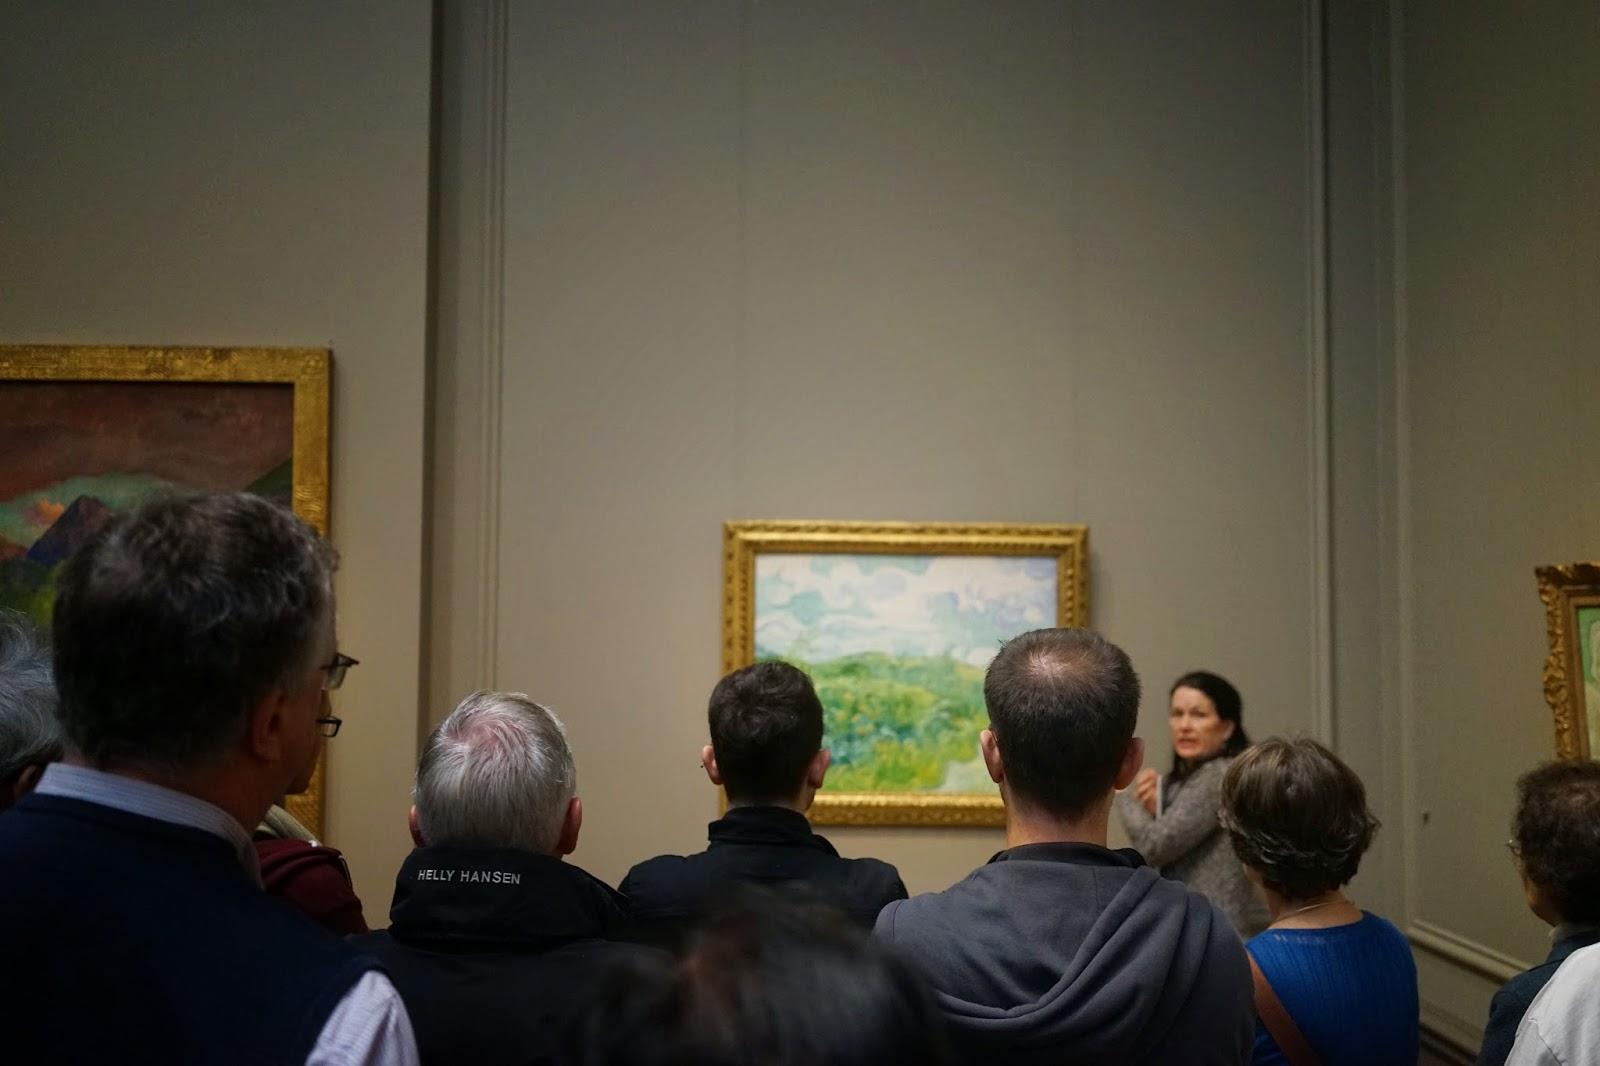 national gallery of art washington D.C